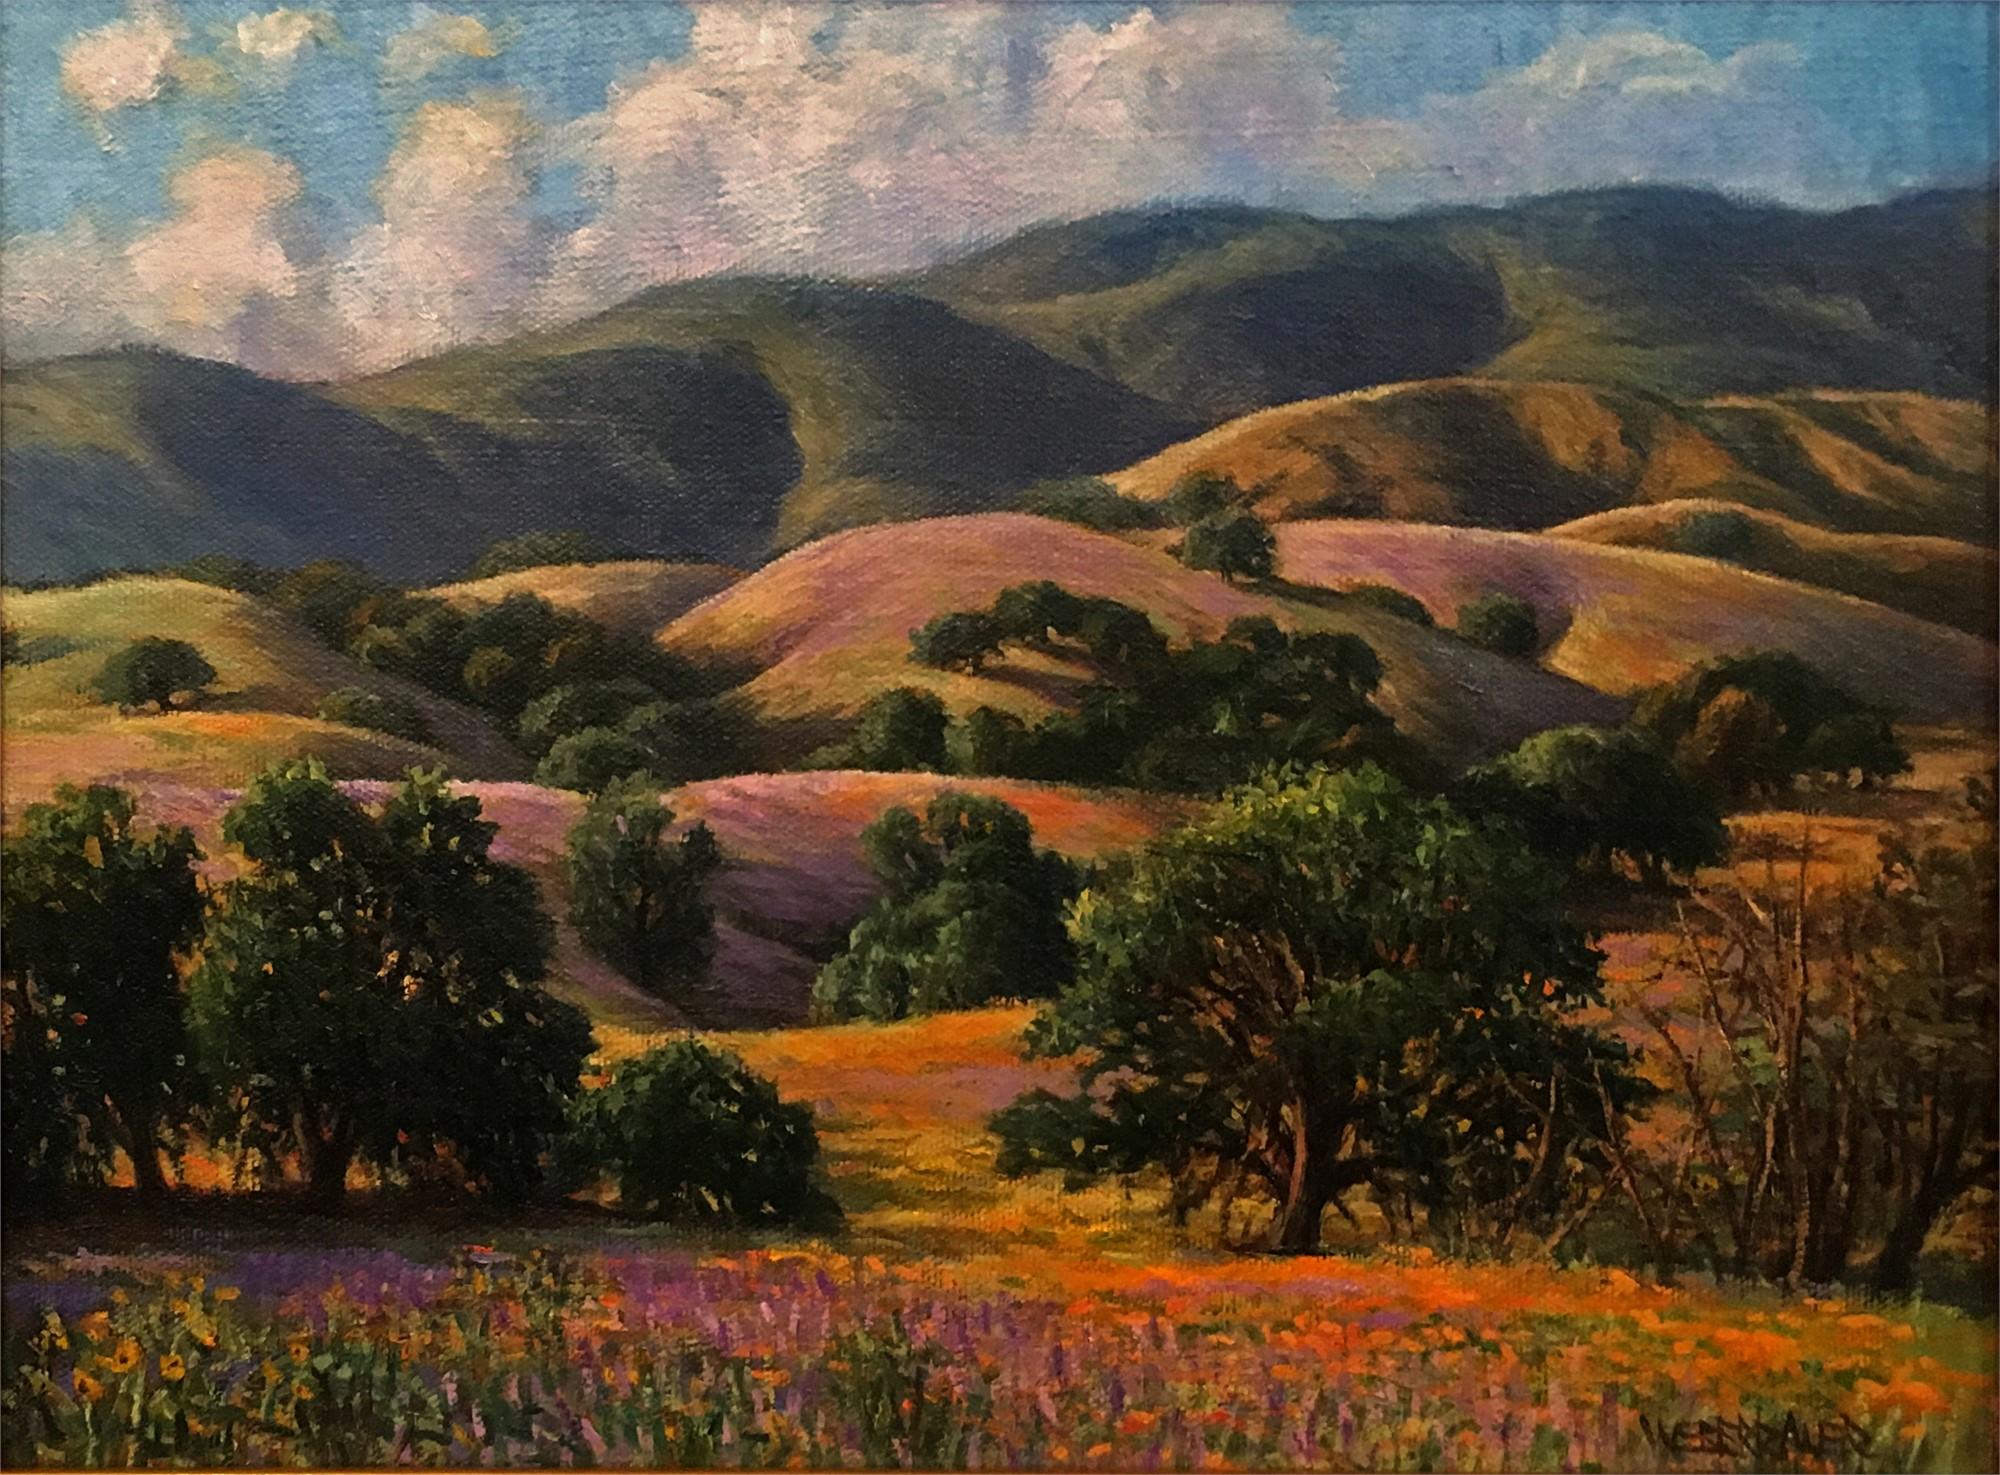 California Fields by WEBERBAUER